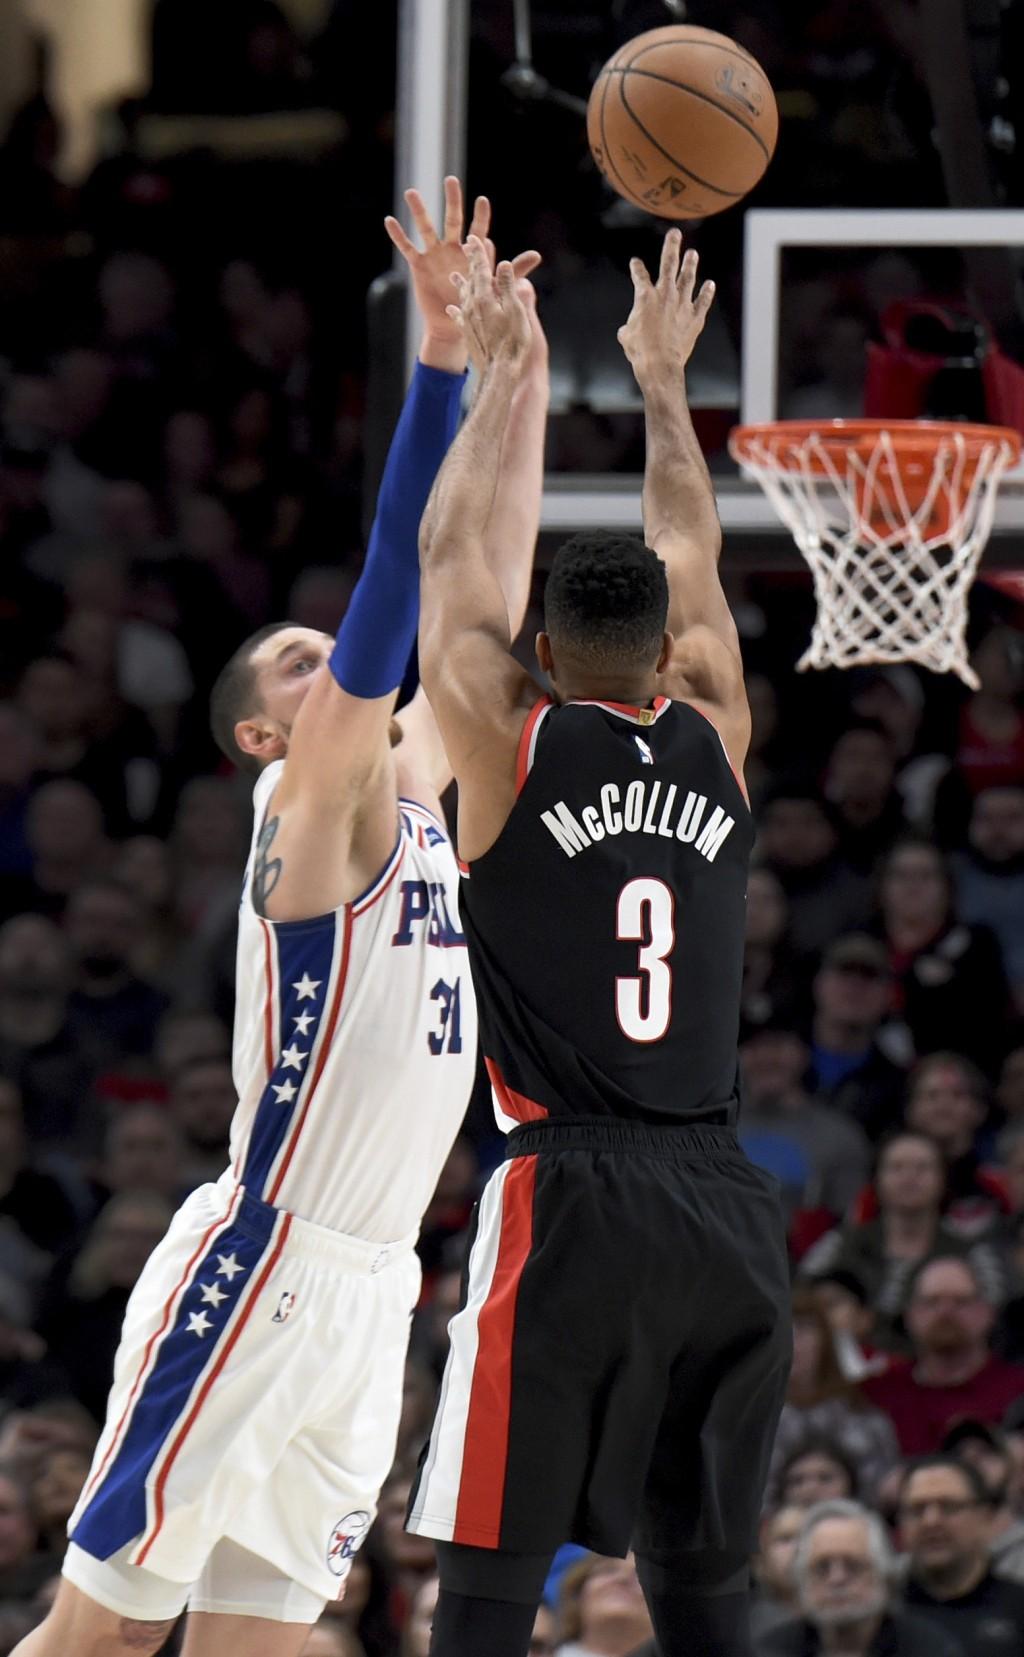 Portland Trail Blazers guard CJ McCollum, right, hits a shot over Philadelphia 76ers forward Mike Muscala, left, during the first half of an NBA baske...